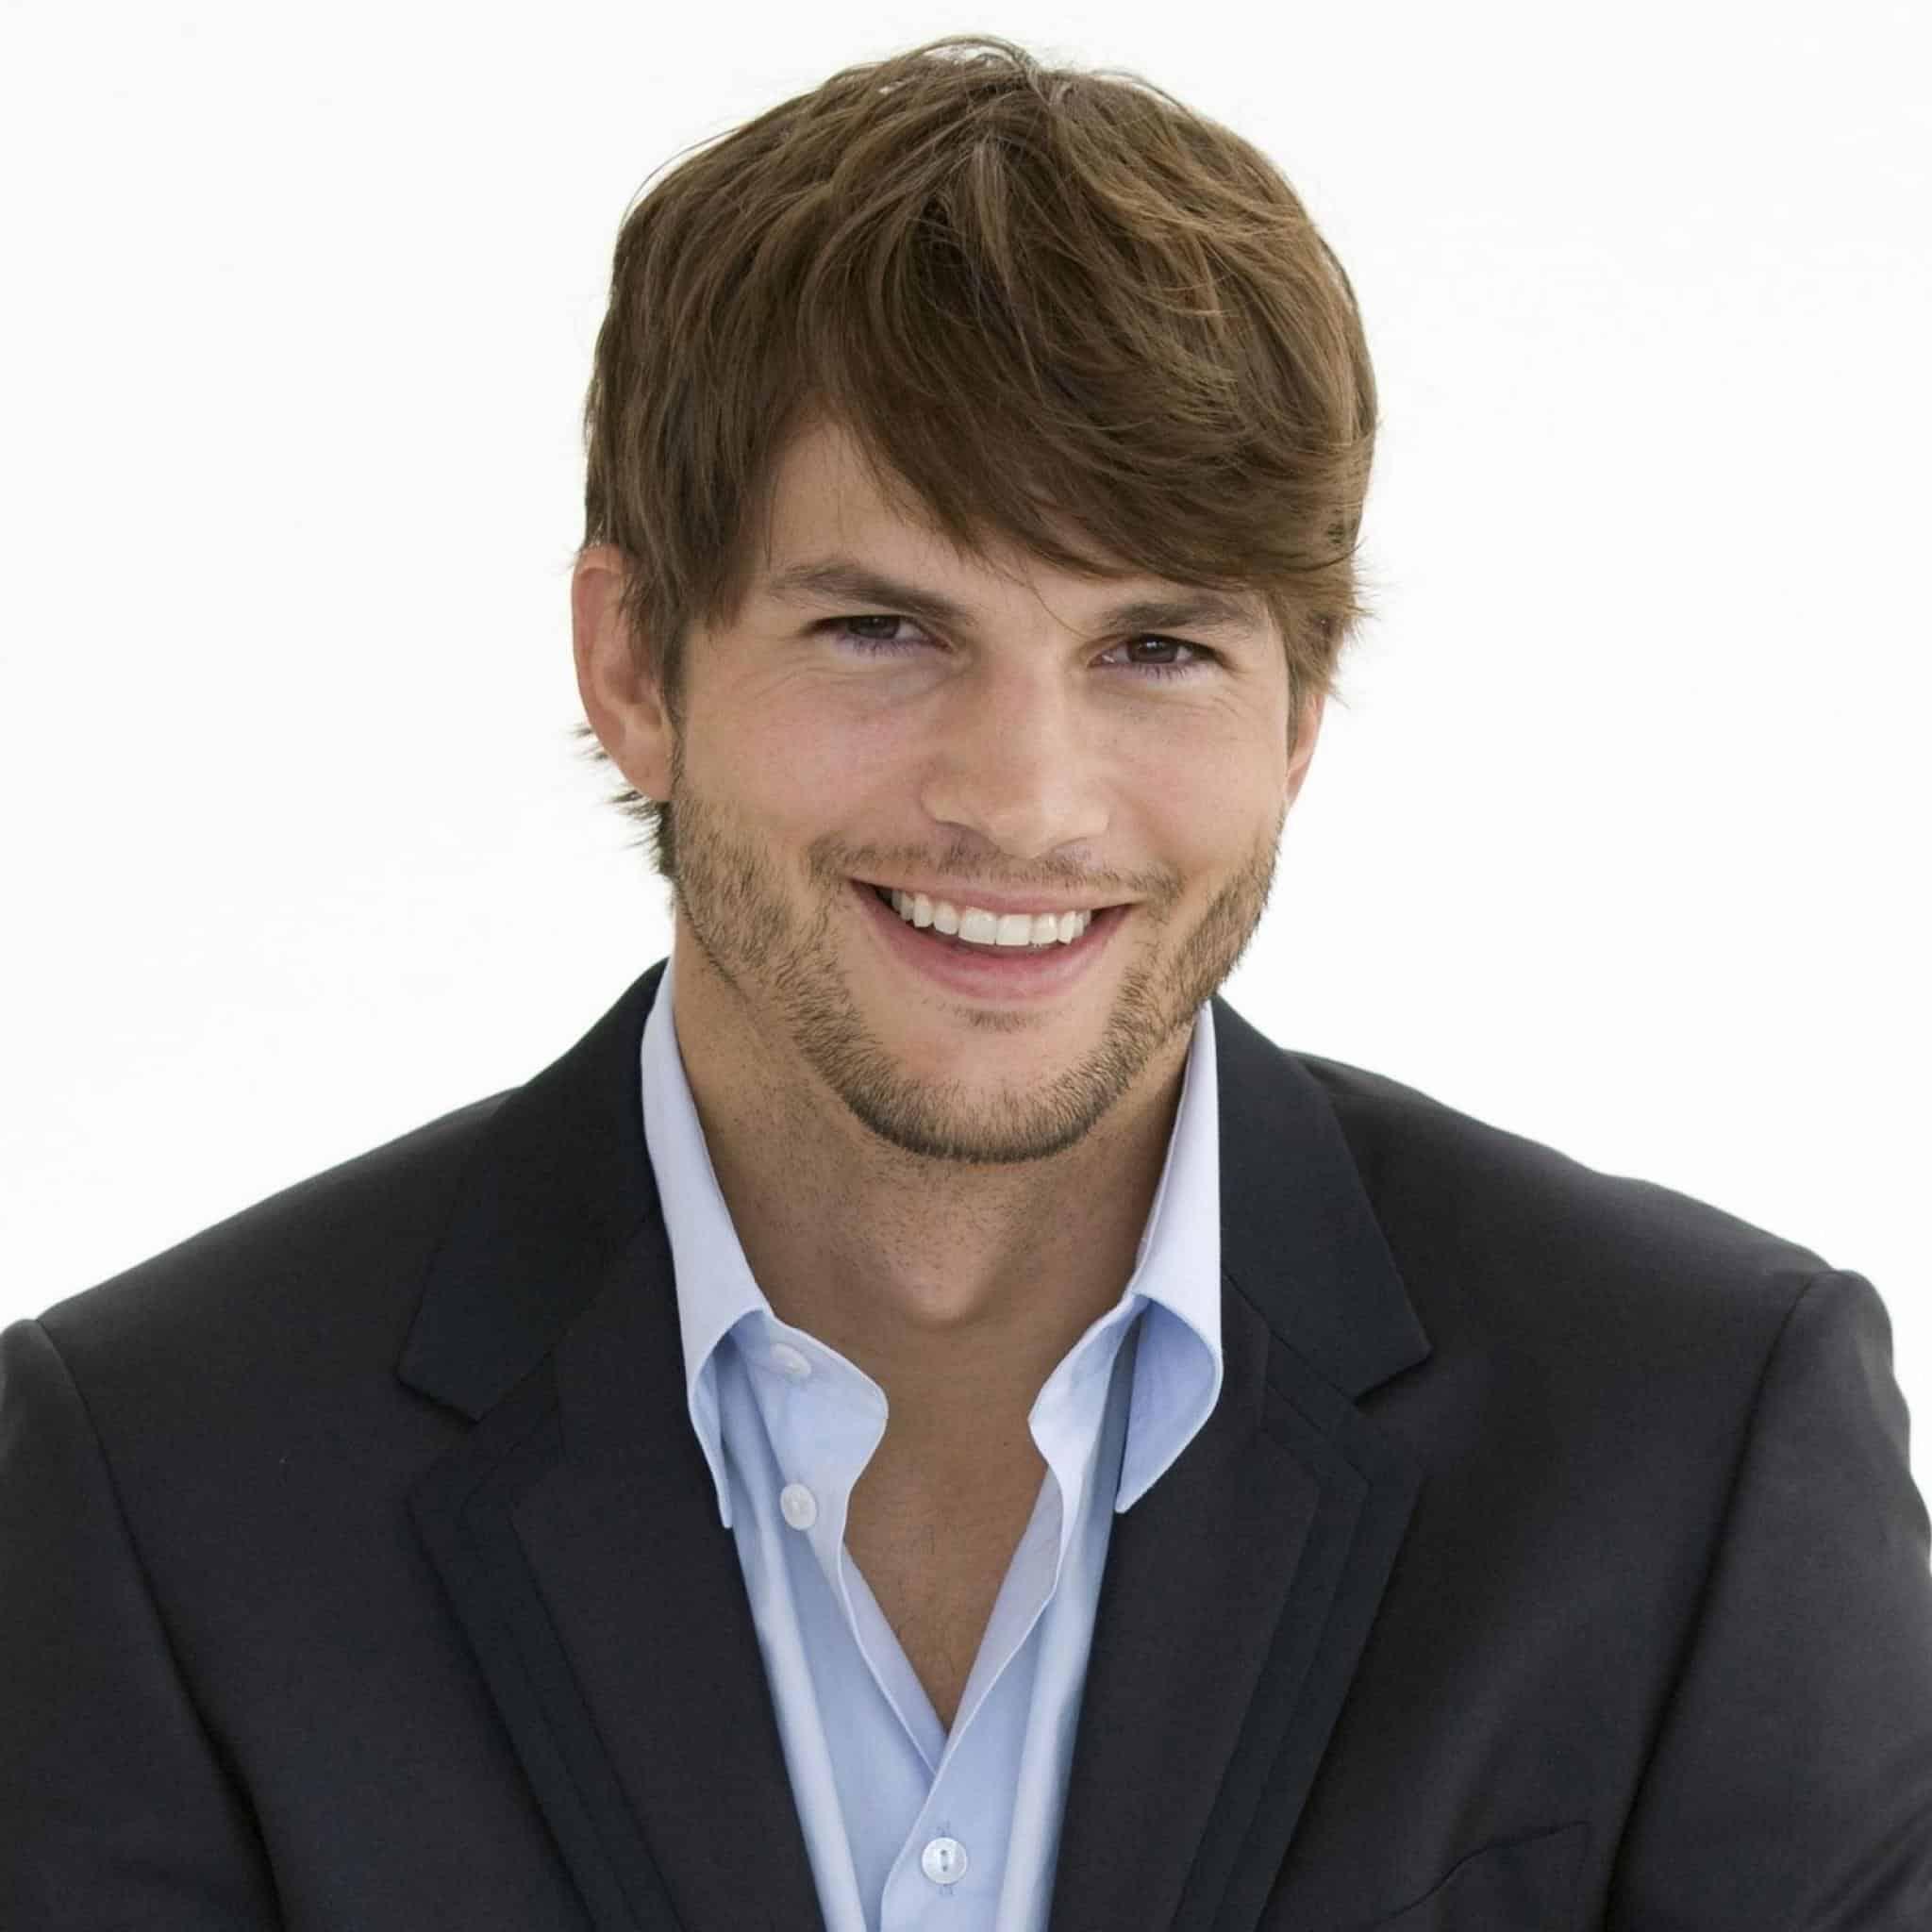 Celebrity of the Week: Ashton Kutcher